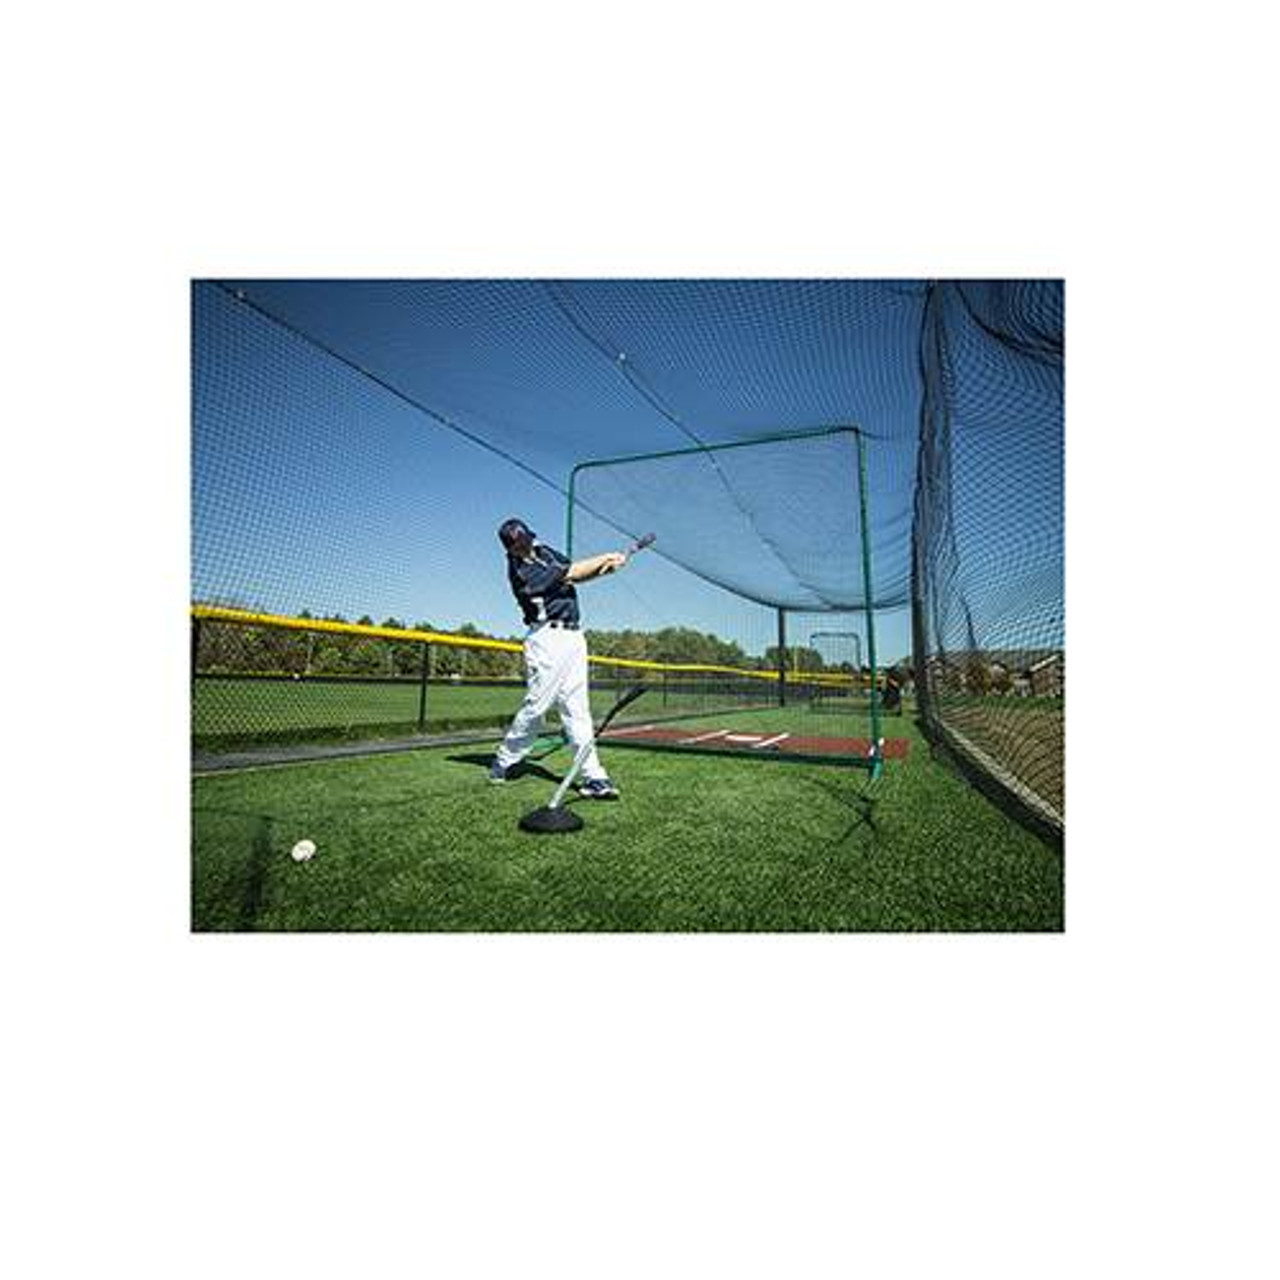 The PVTee baseball batting tee